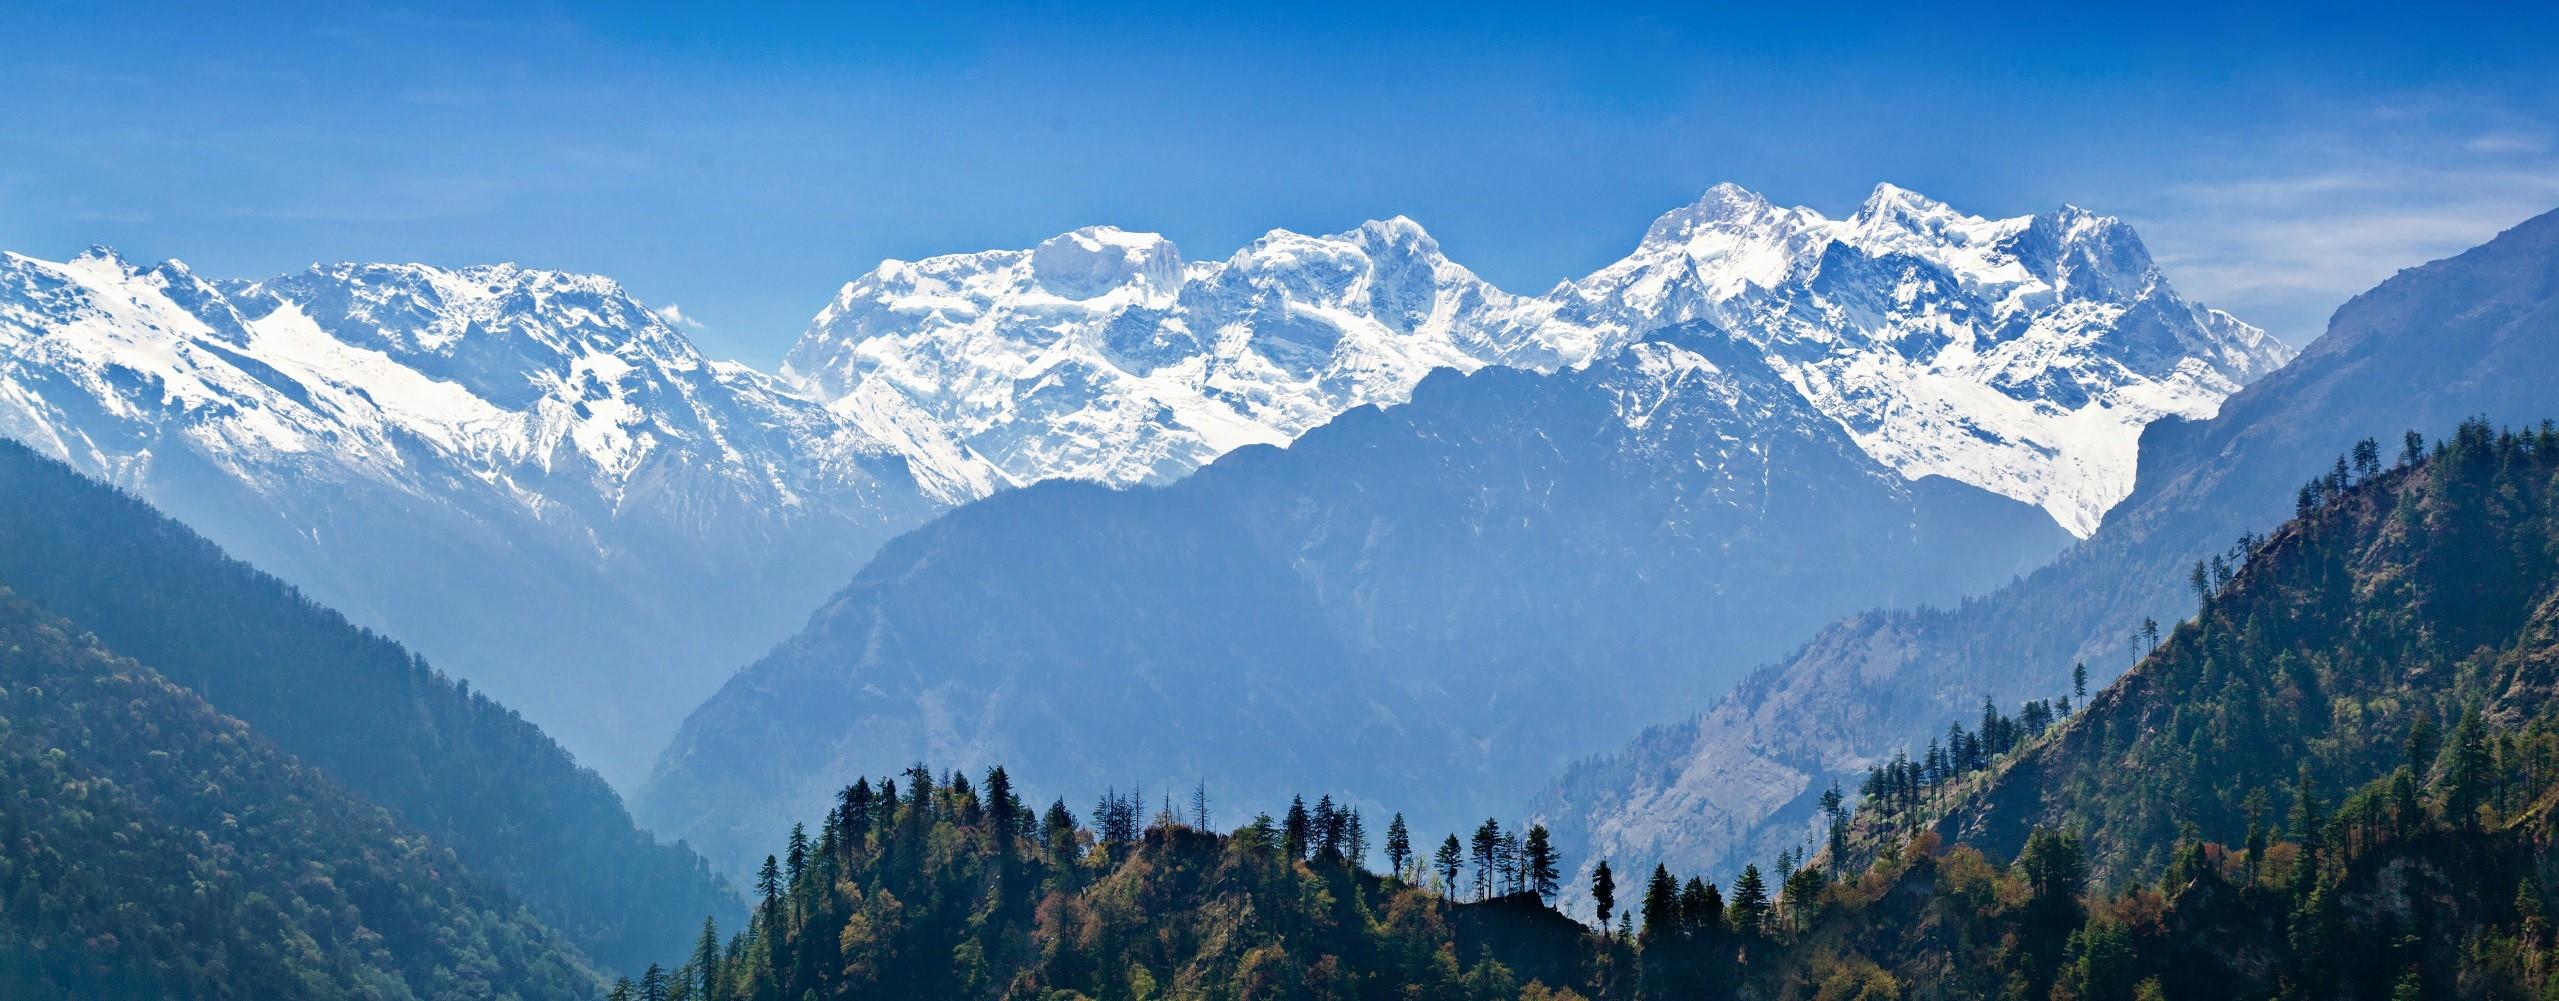 Nepal - Manaslu Range